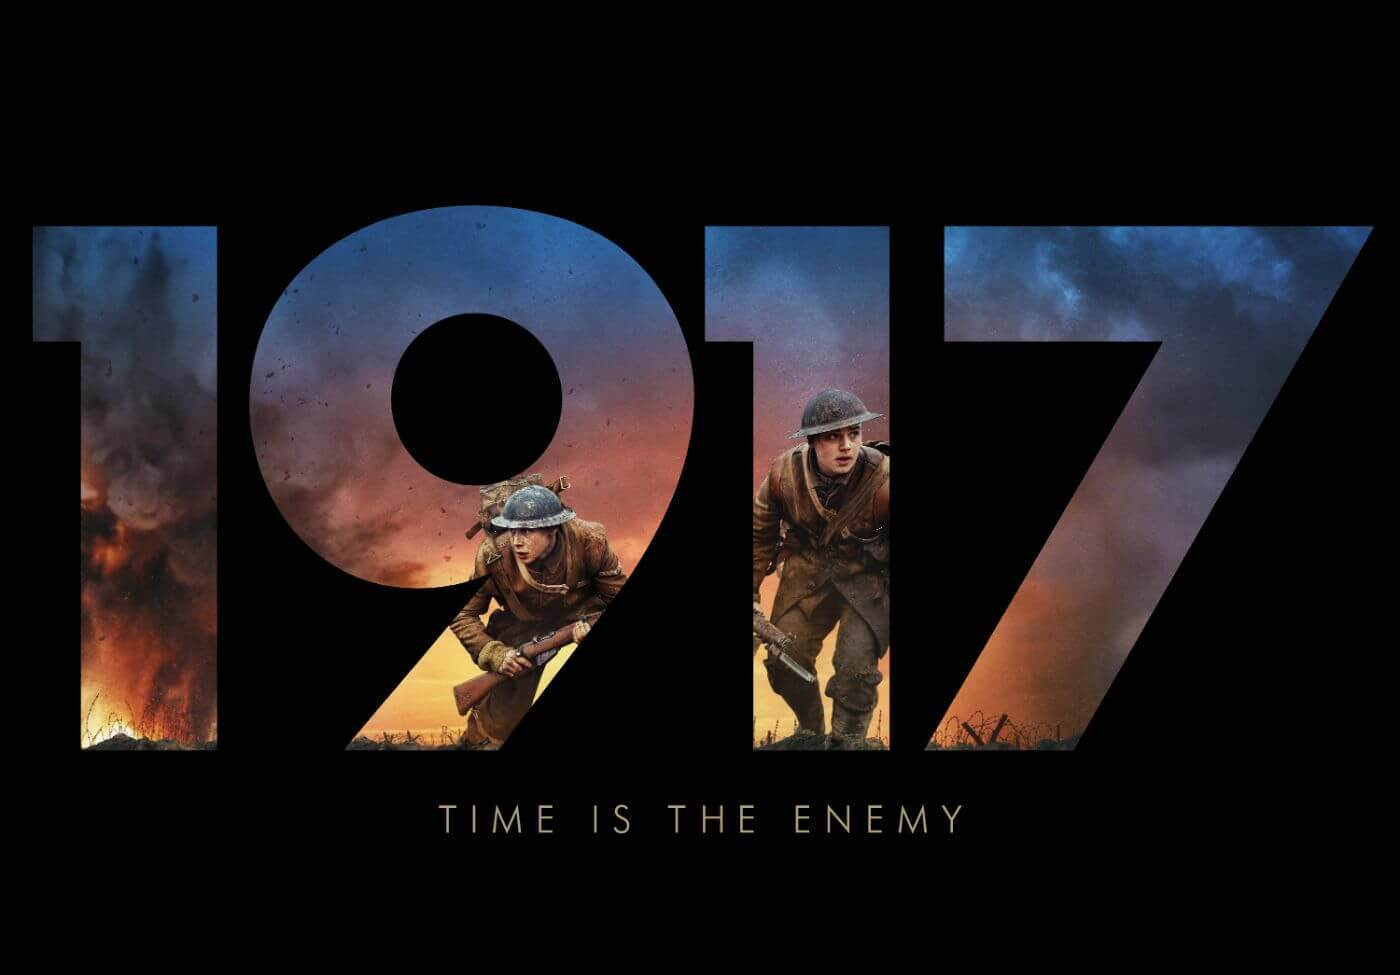 1917_-_Sam_Mendes_WW1_Epic_-_Hollywood_War_Film_Classic_English_Movie_Poster_bf90ded1-6c2e-4c77-b7bb-1bfbc42888d1